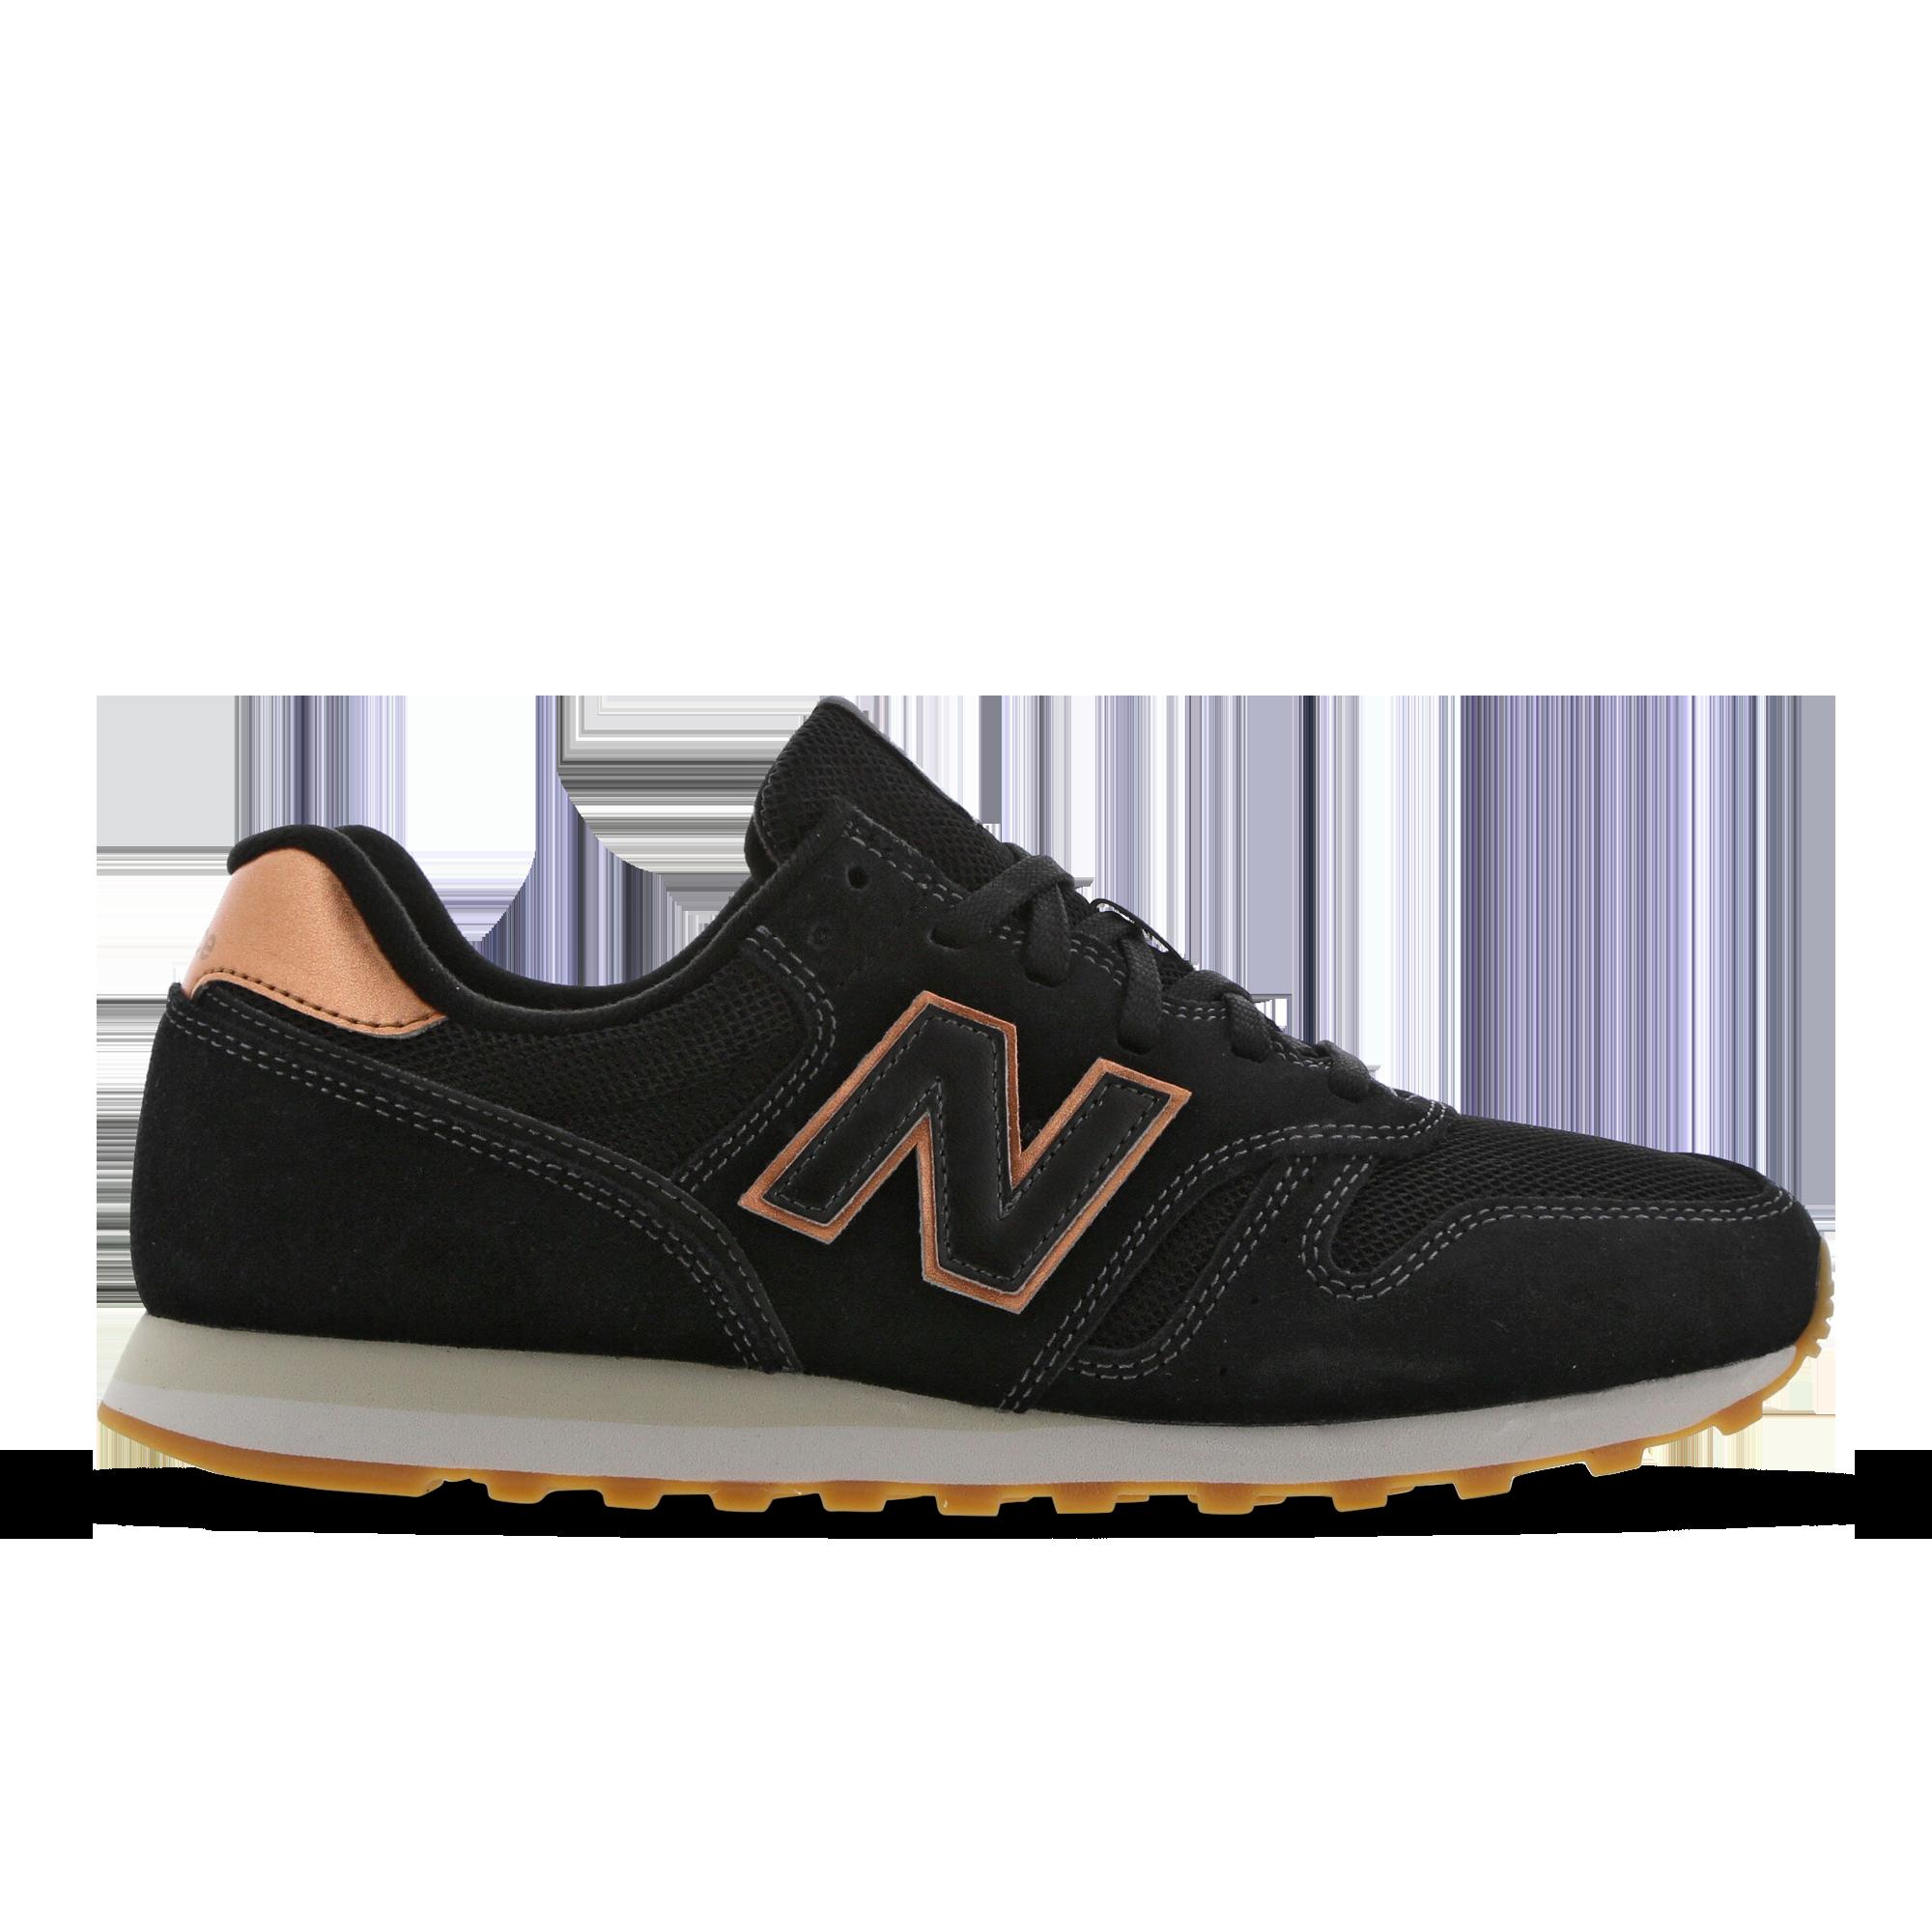 new balance womens 373 sneaker, OFF 79%,Cheap price !